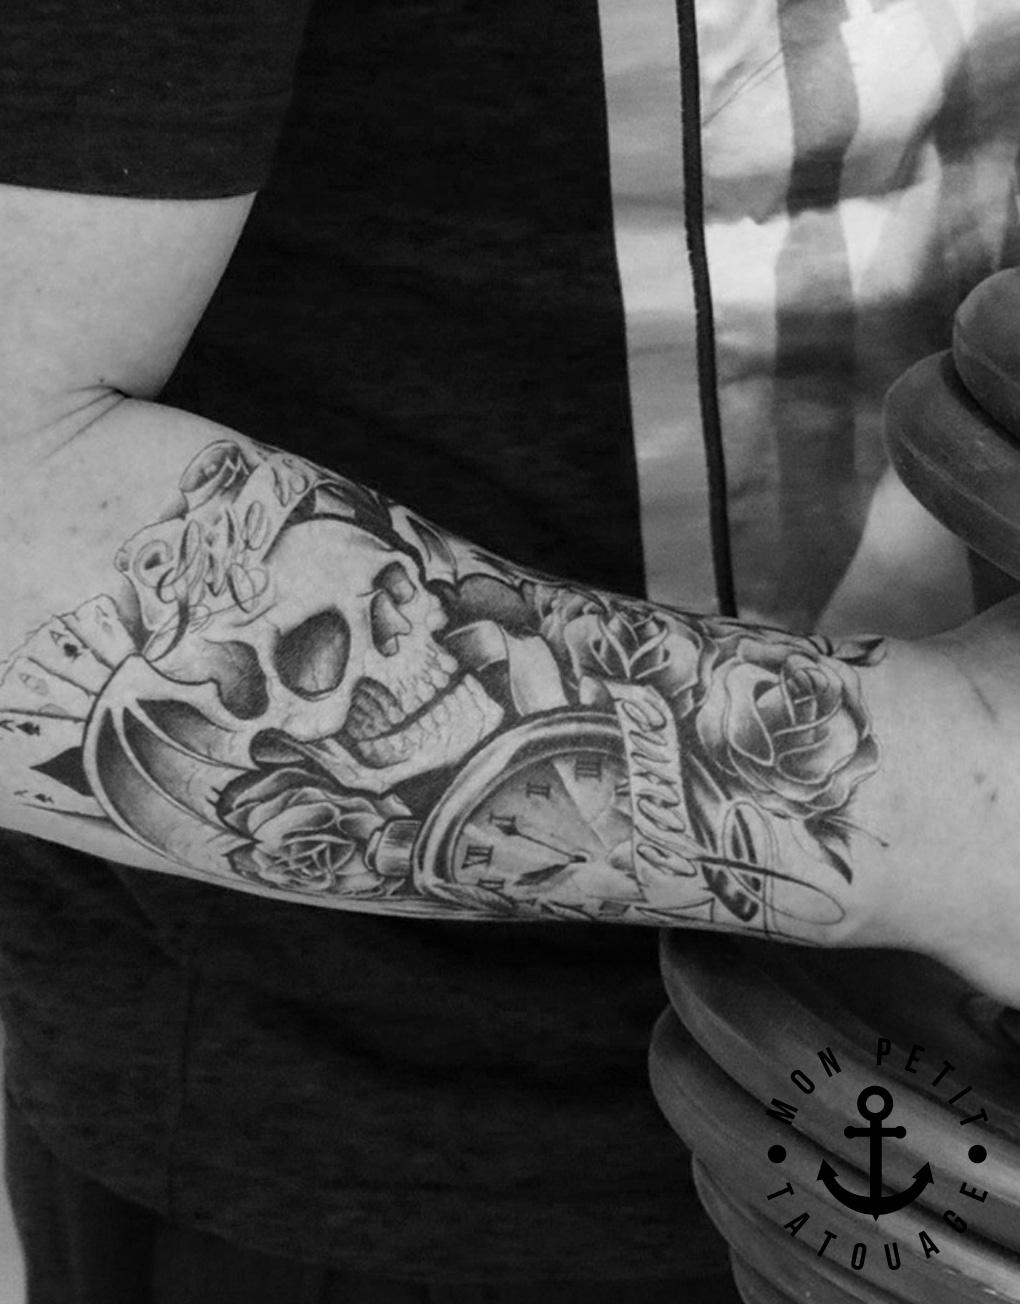 tatouage femme tete de mort galerie tatouage. Black Bedroom Furniture Sets. Home Design Ideas